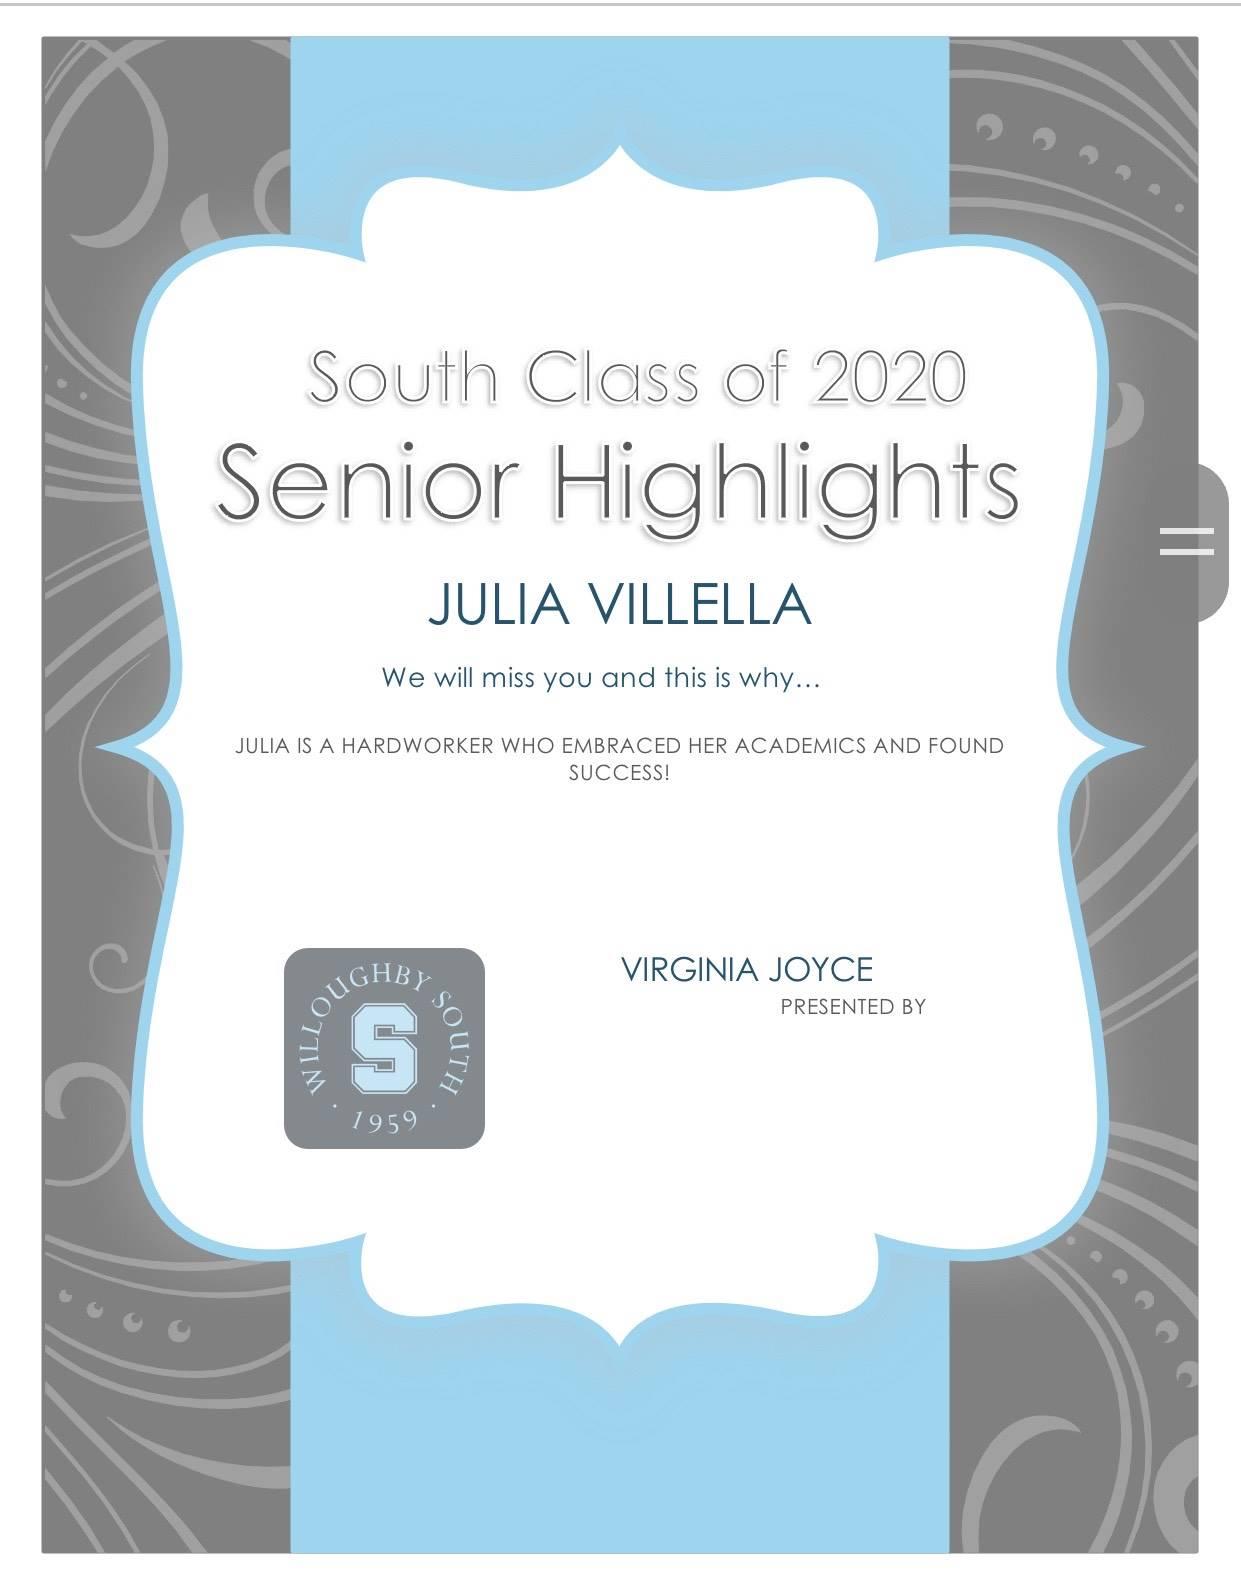 Julia Villella